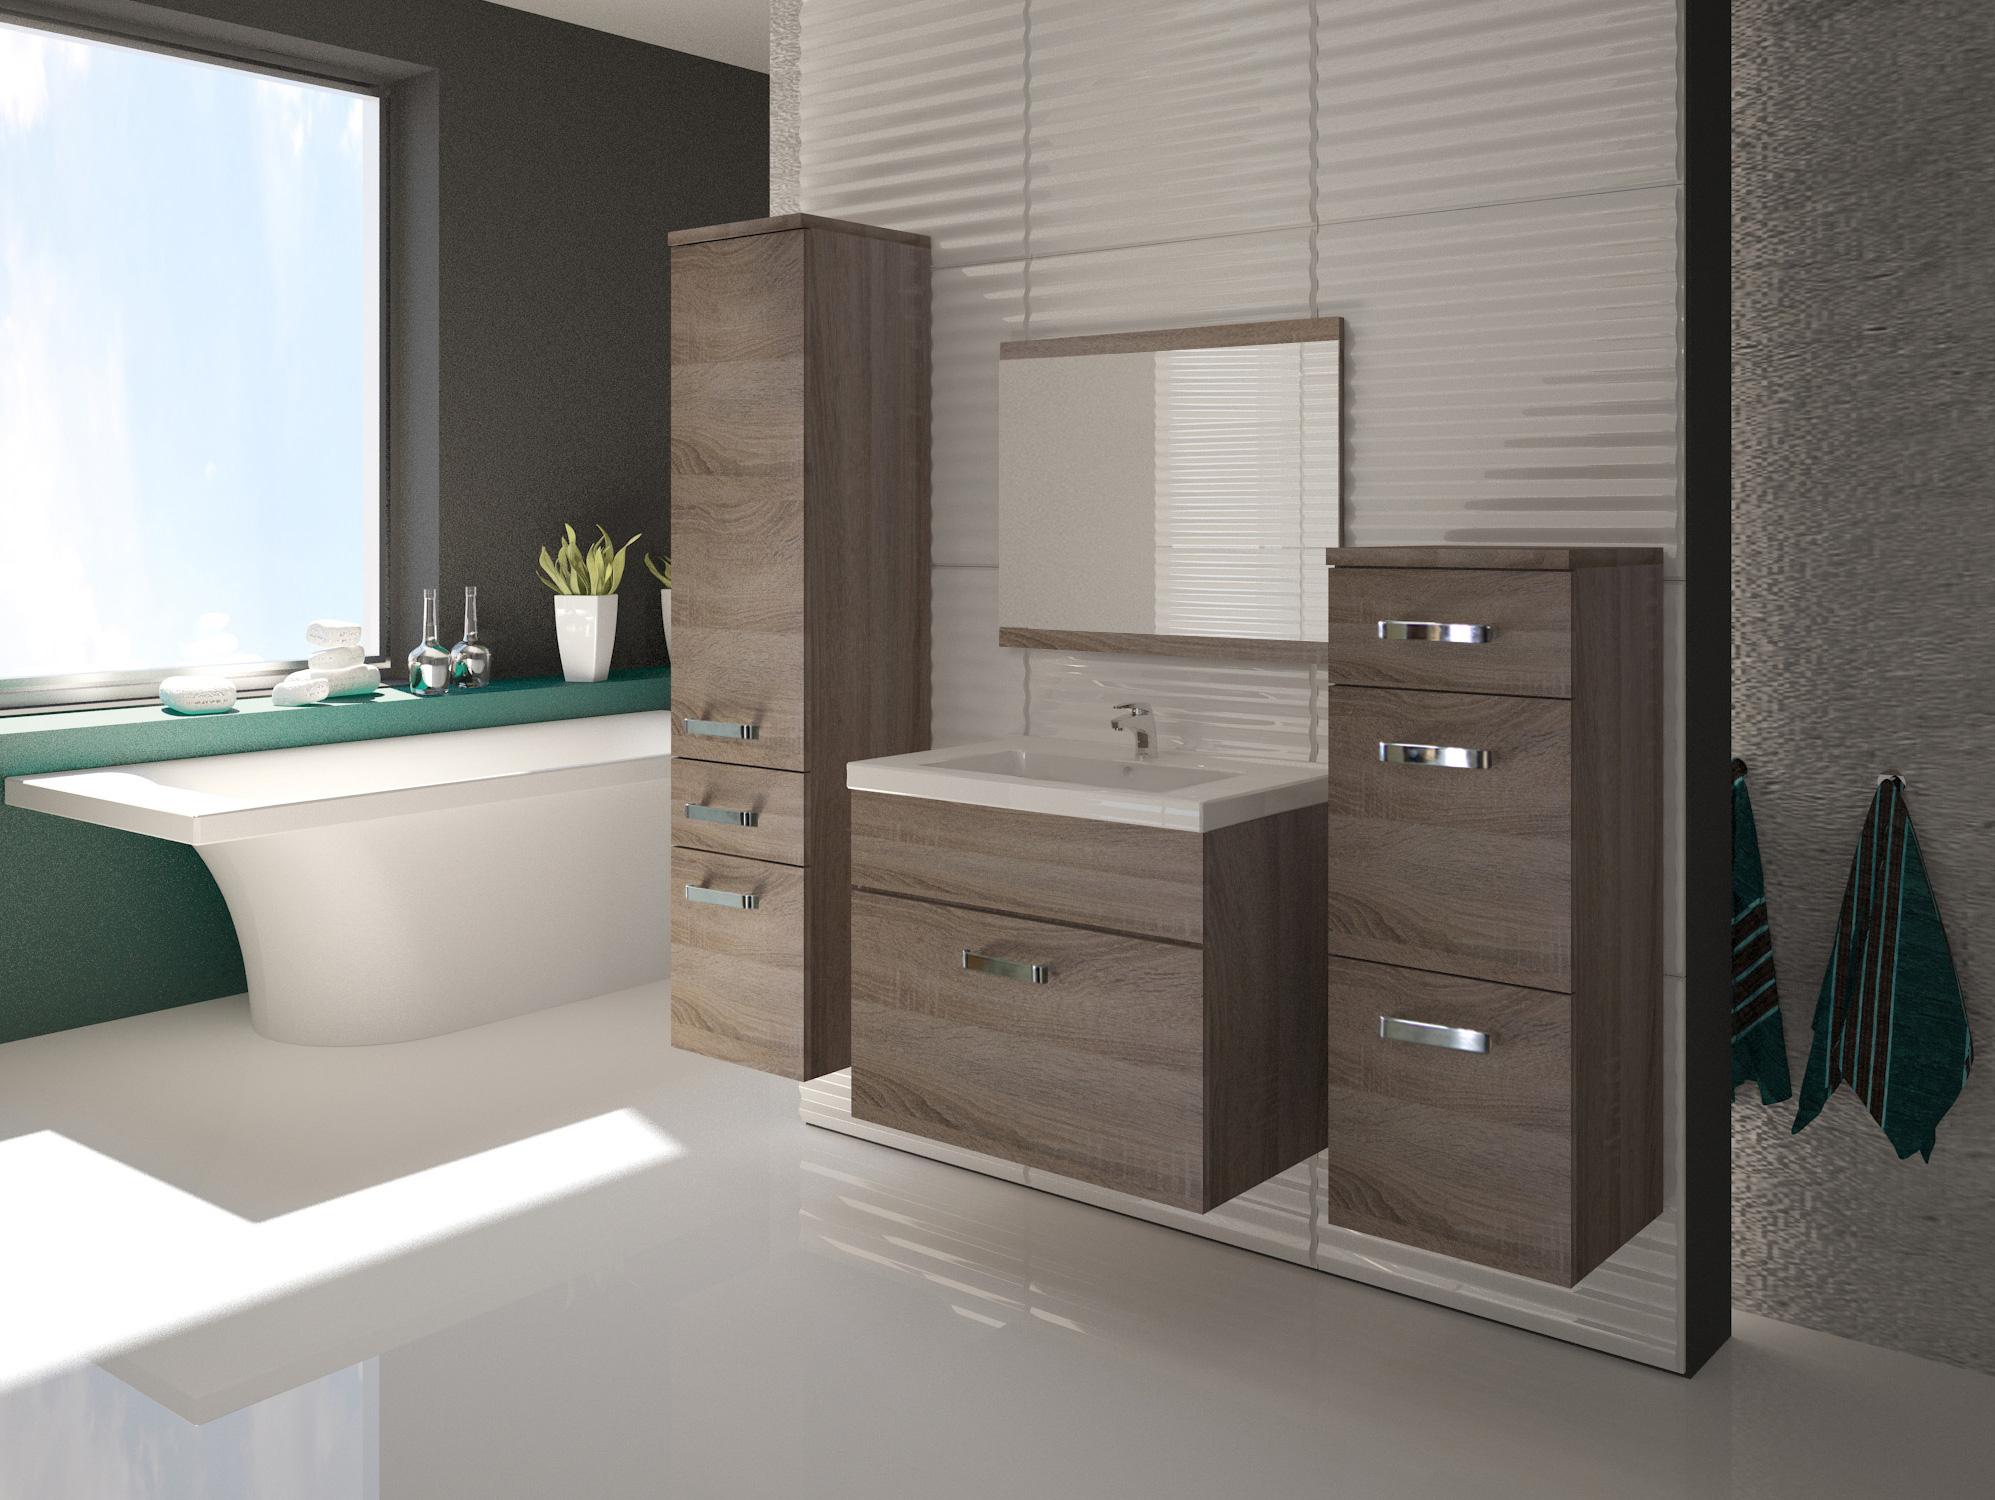 evol kommode eiche sonoma tr ffel nachbildung mdf. Black Bedroom Furniture Sets. Home Design Ideas